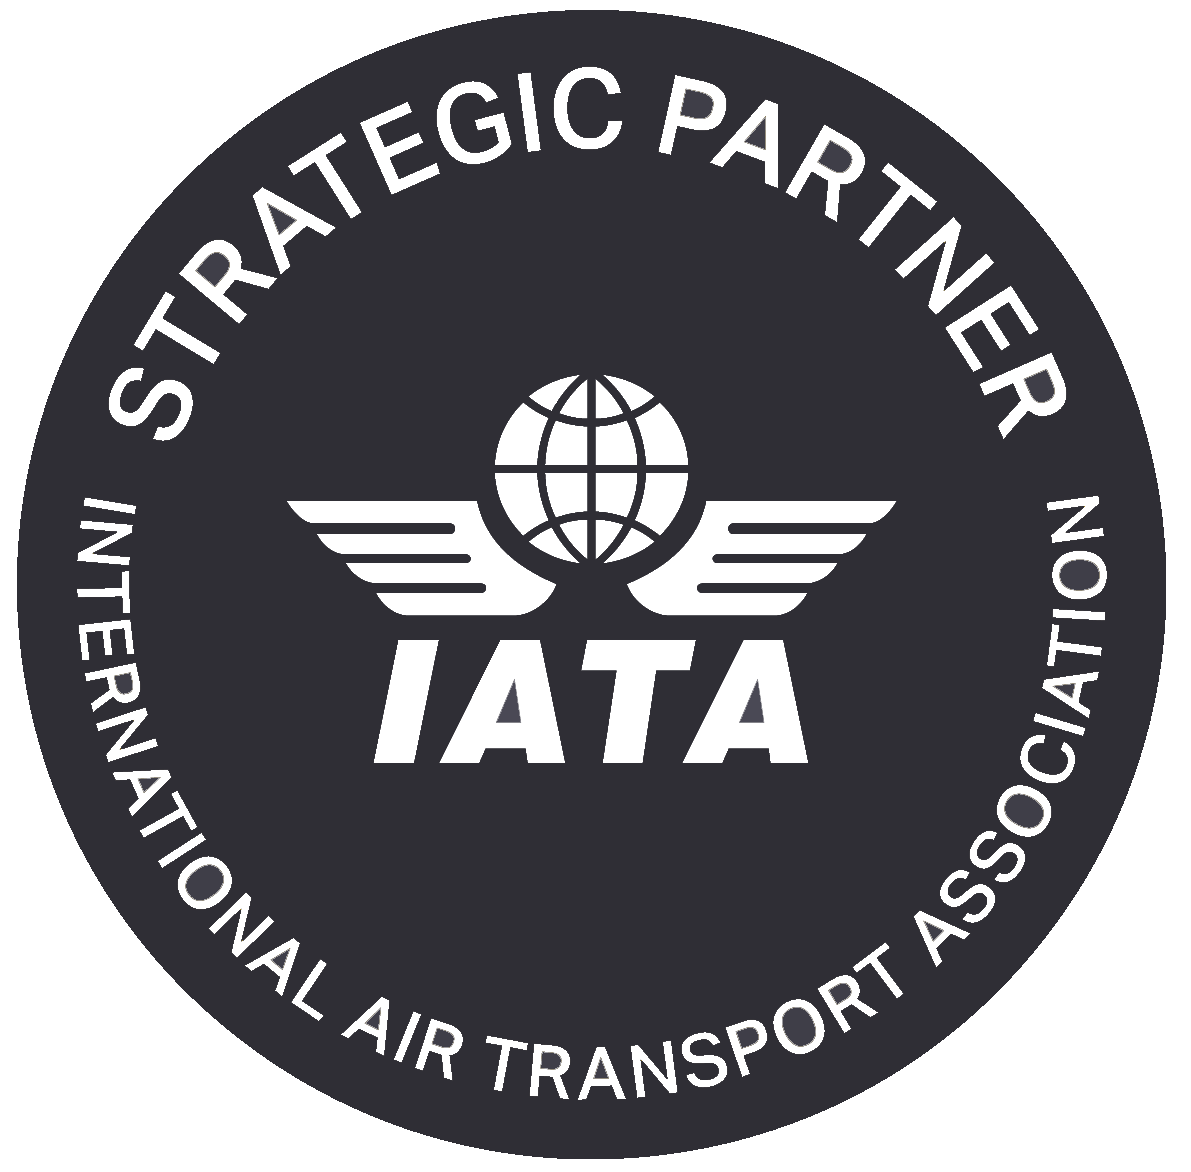 IATA Strategic Partner Off Black